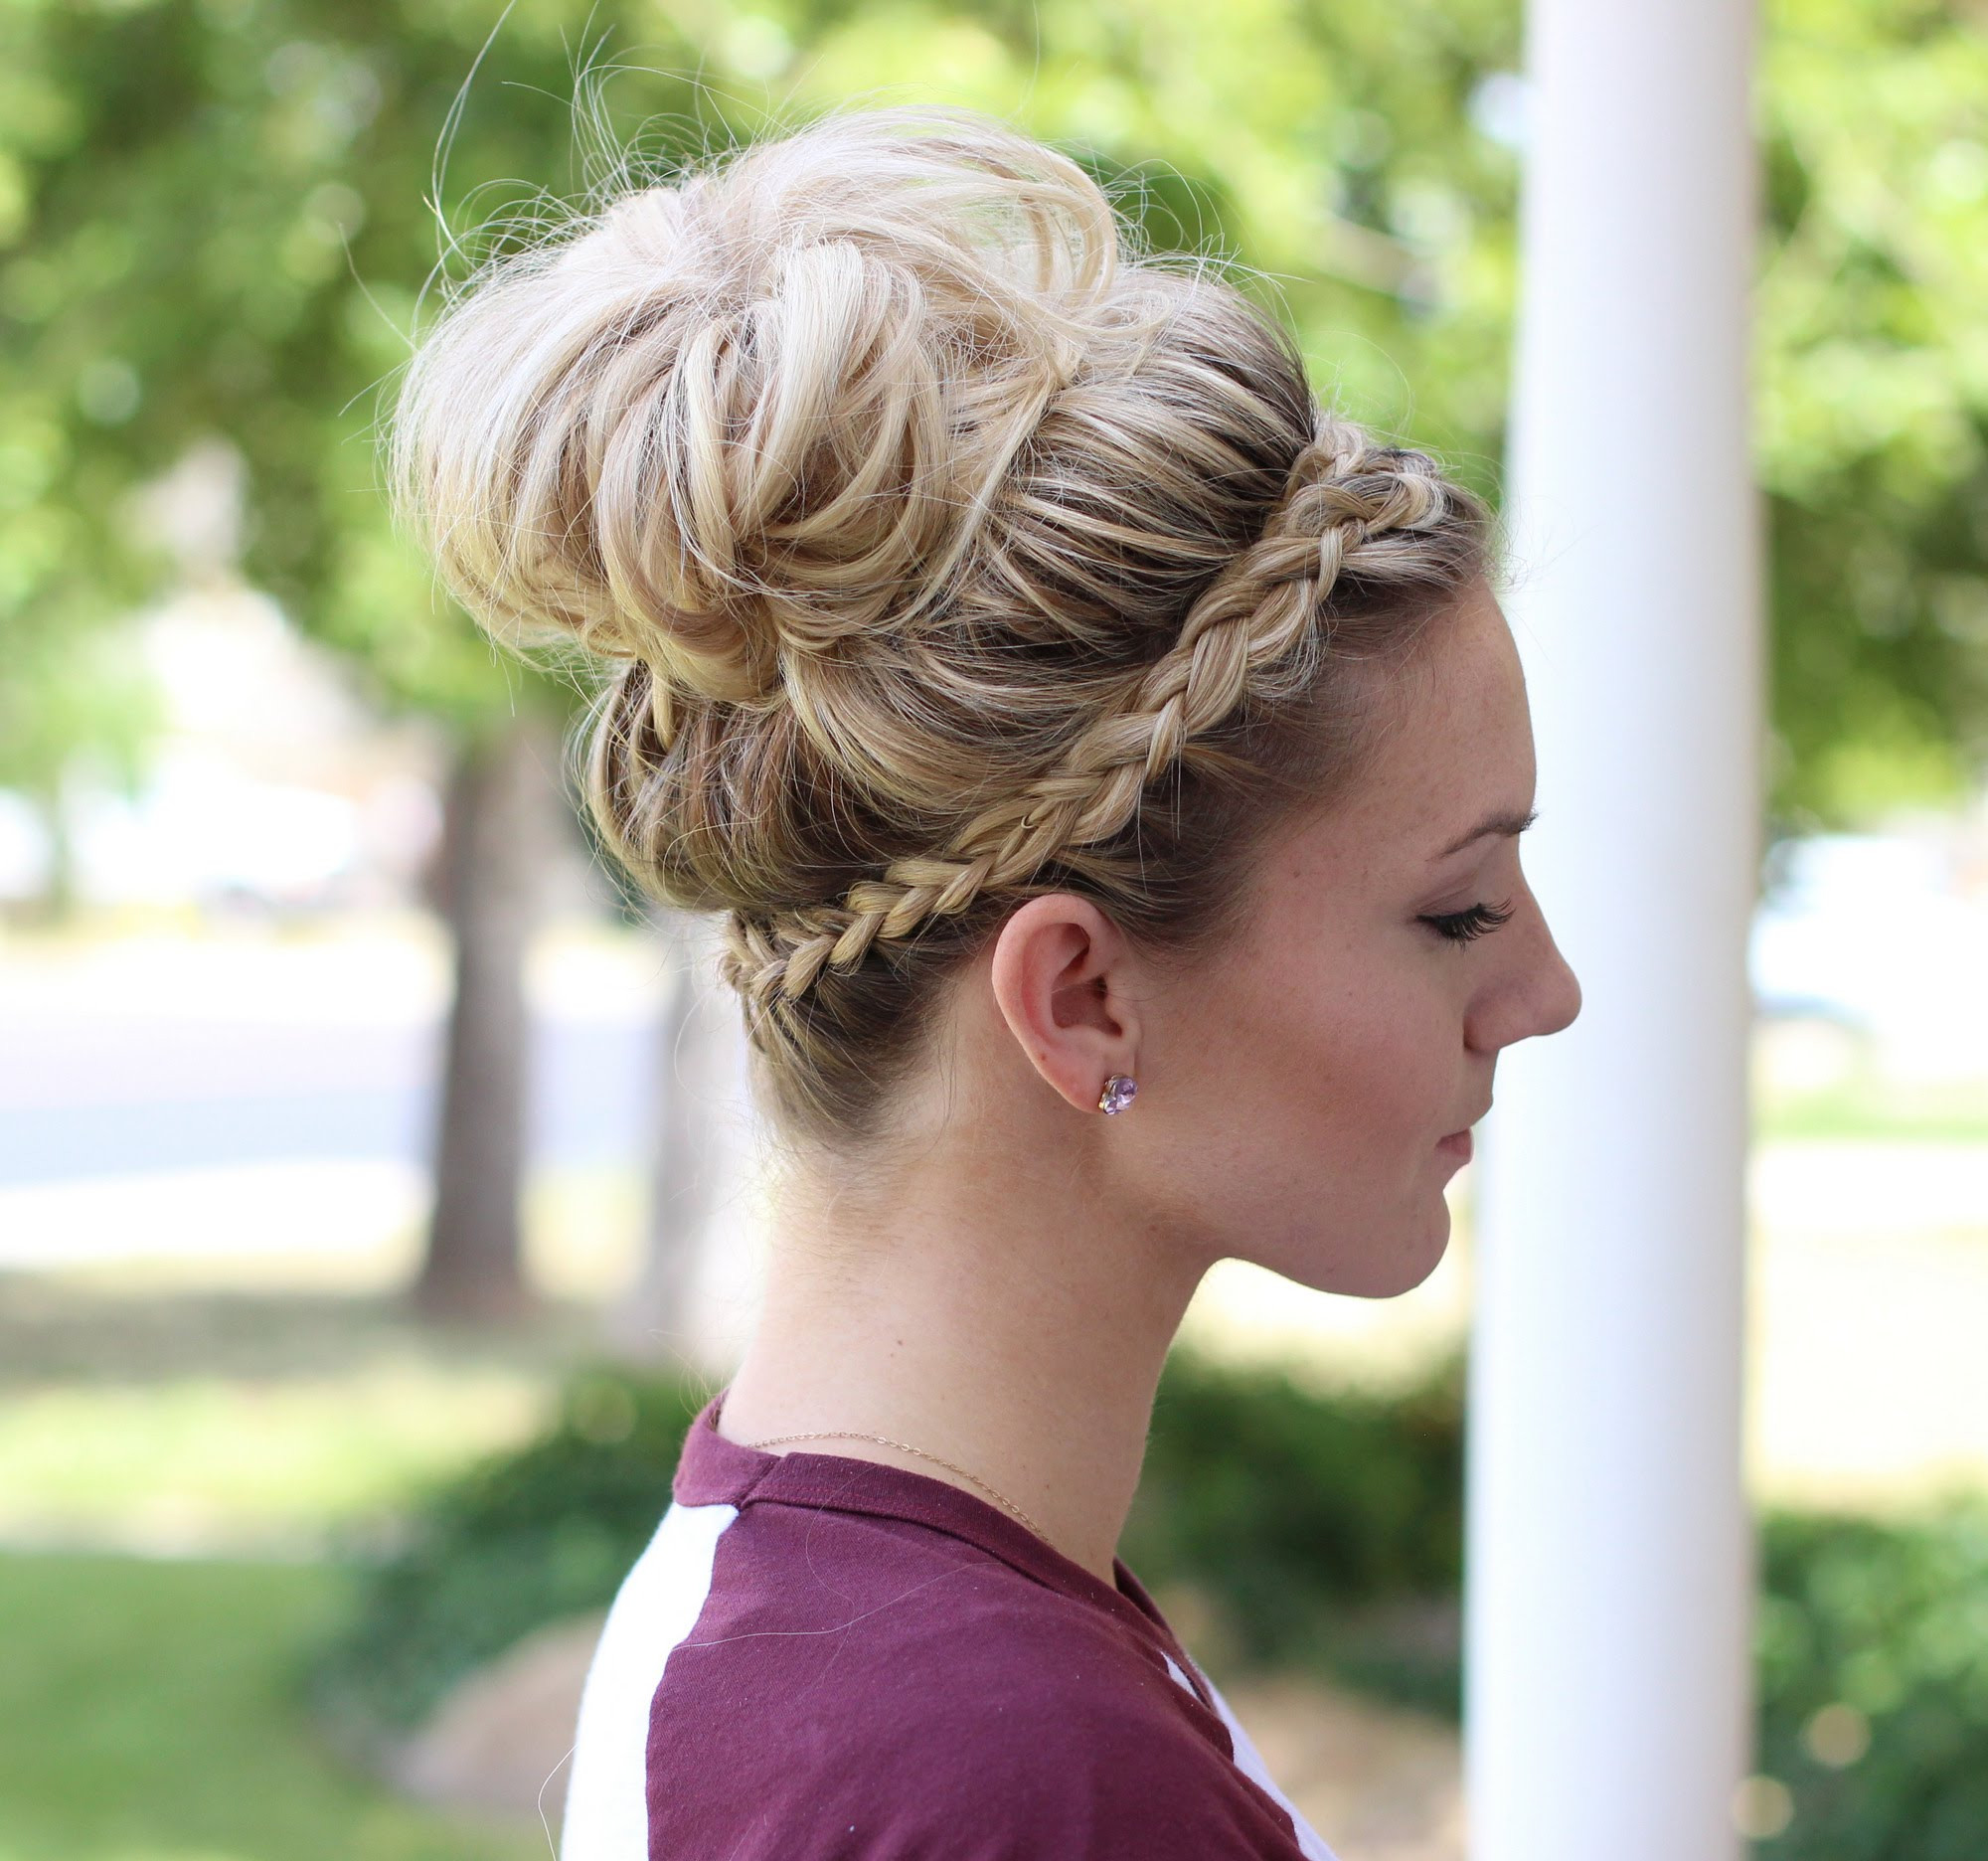 Braid Bun Hairstyles  Classy and Elegant Bun Hairstyles 2016